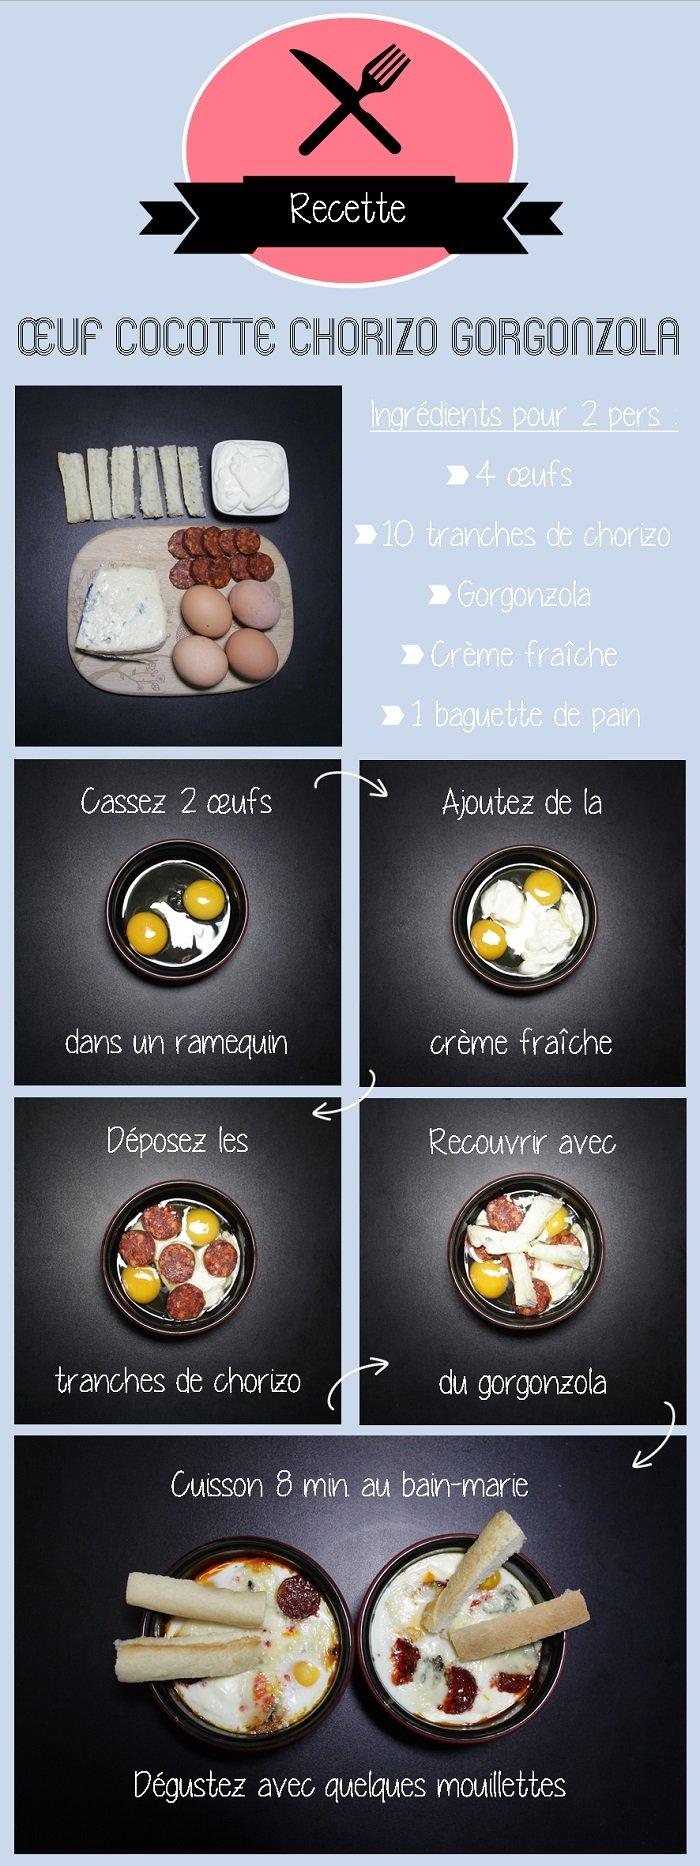 Recette en amoureux / Oeuf cocotte gorgonzola chorizo / + sur withalovelikethat.fr